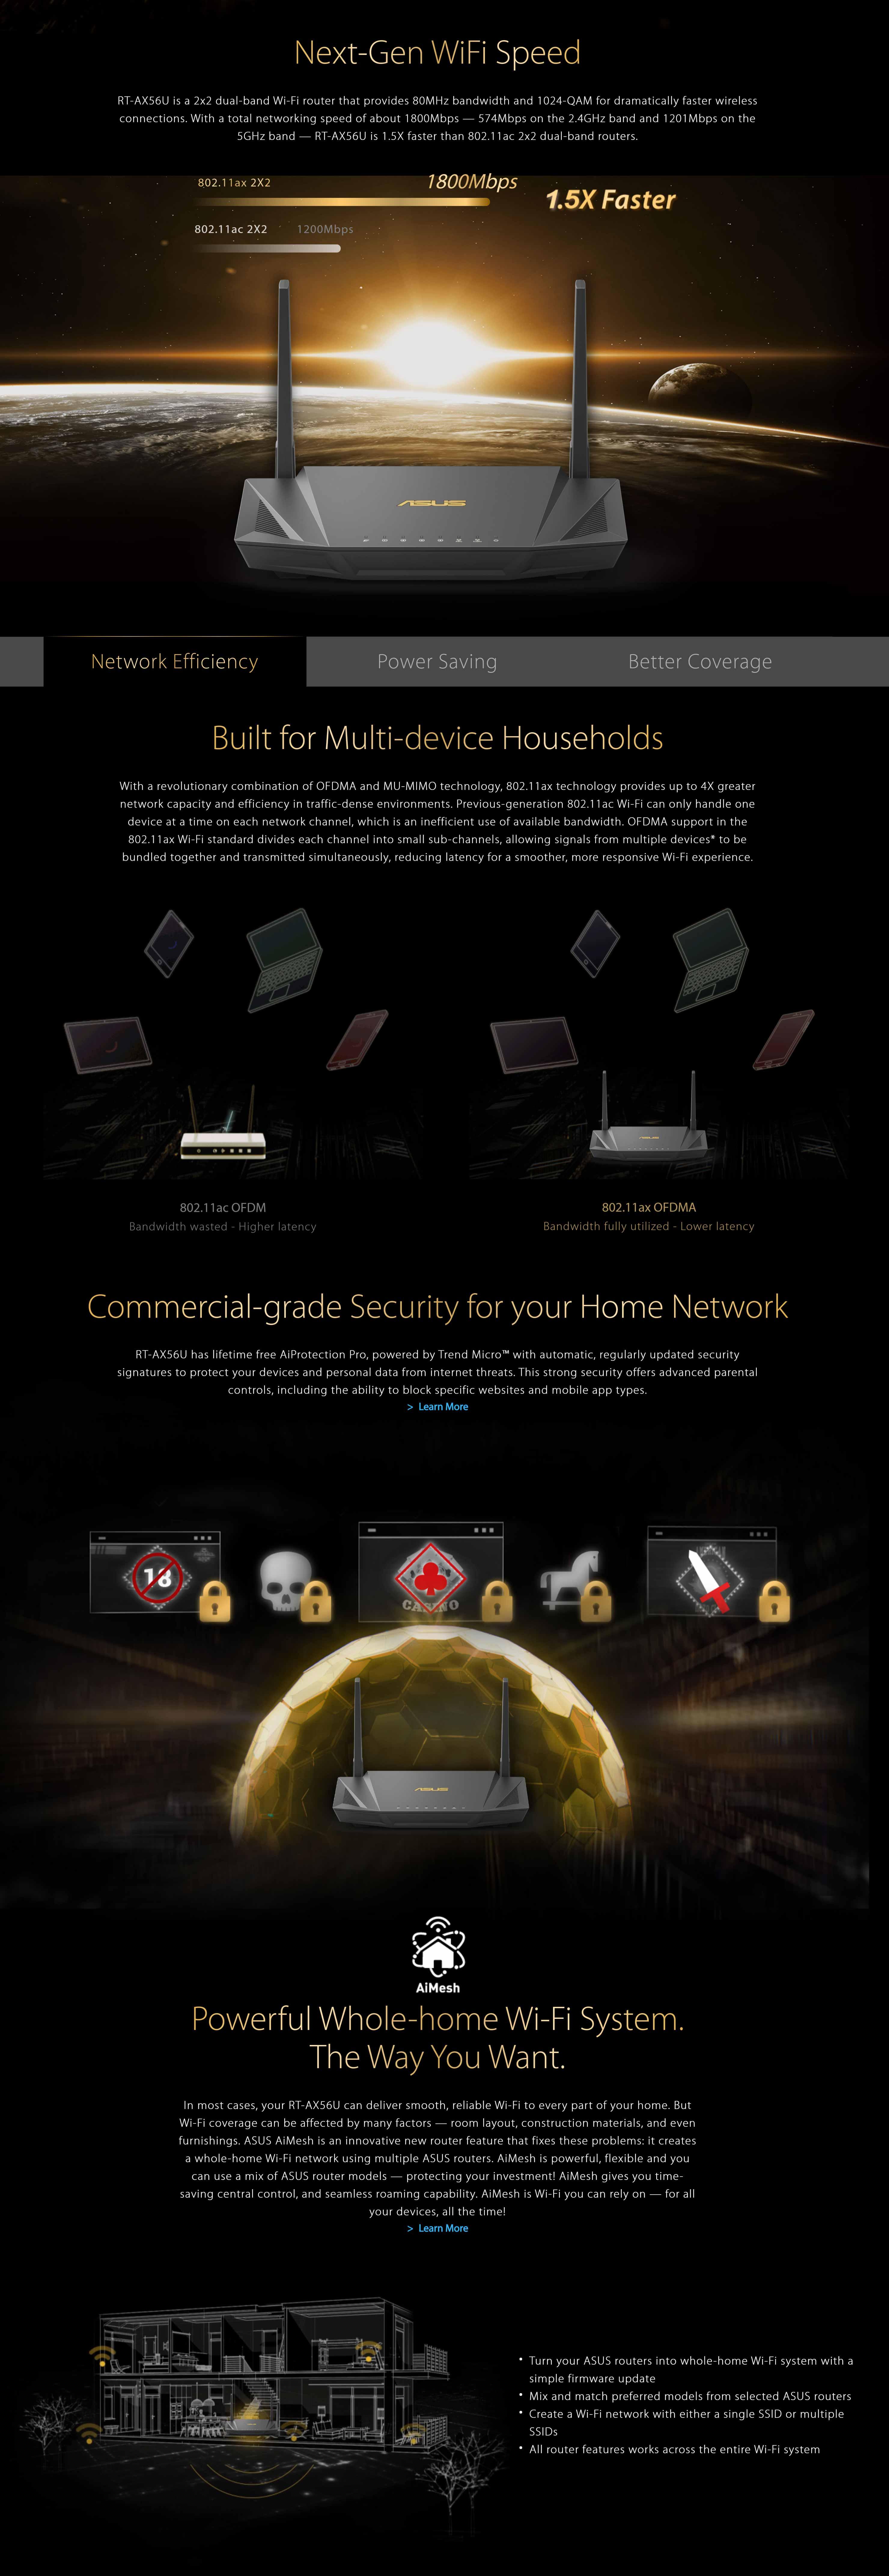 screencapture-asus-Networking-RT-AX56U-2020-01-03-14_47_15.jpg